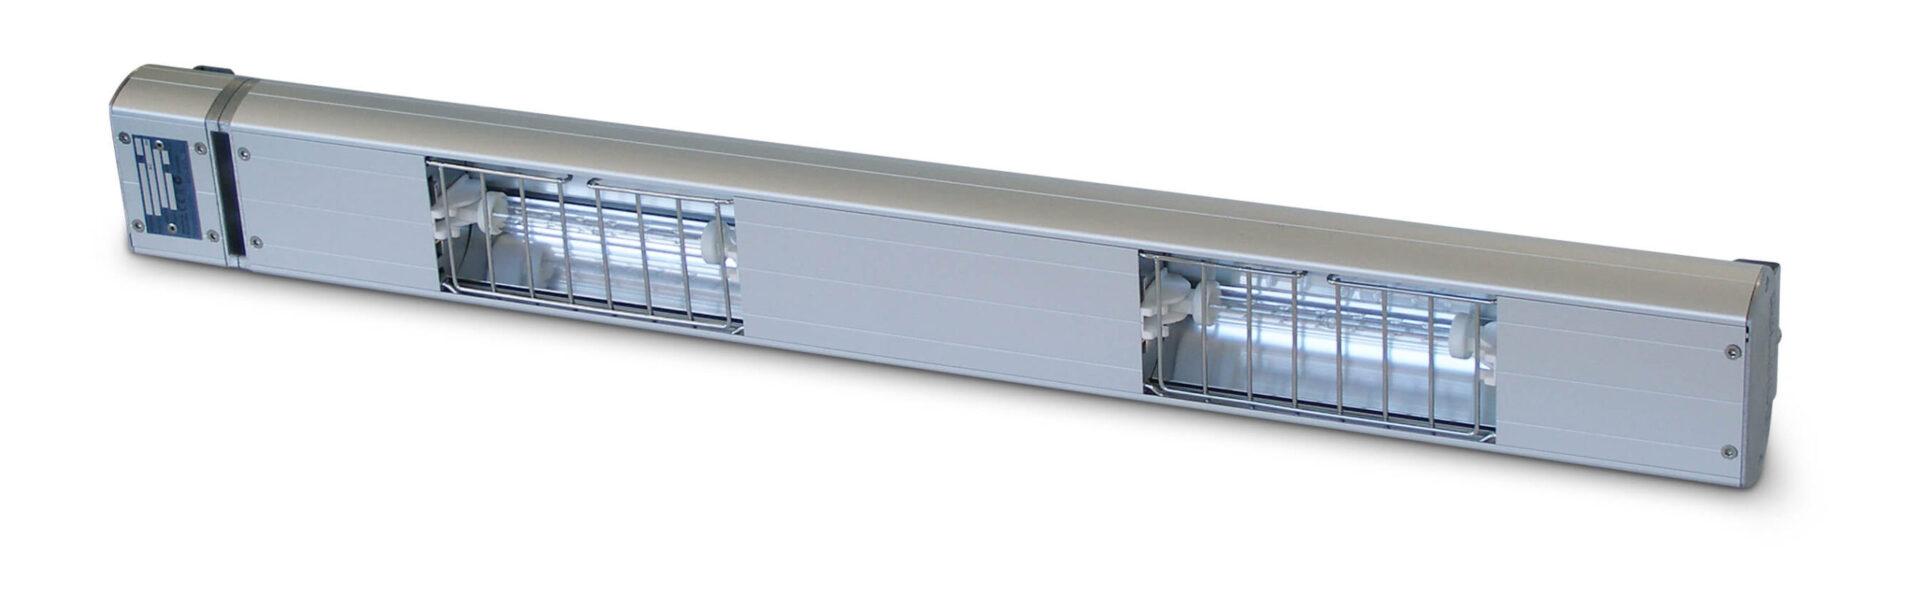 Roband Quartz Heat Lamp Assembly 900mm